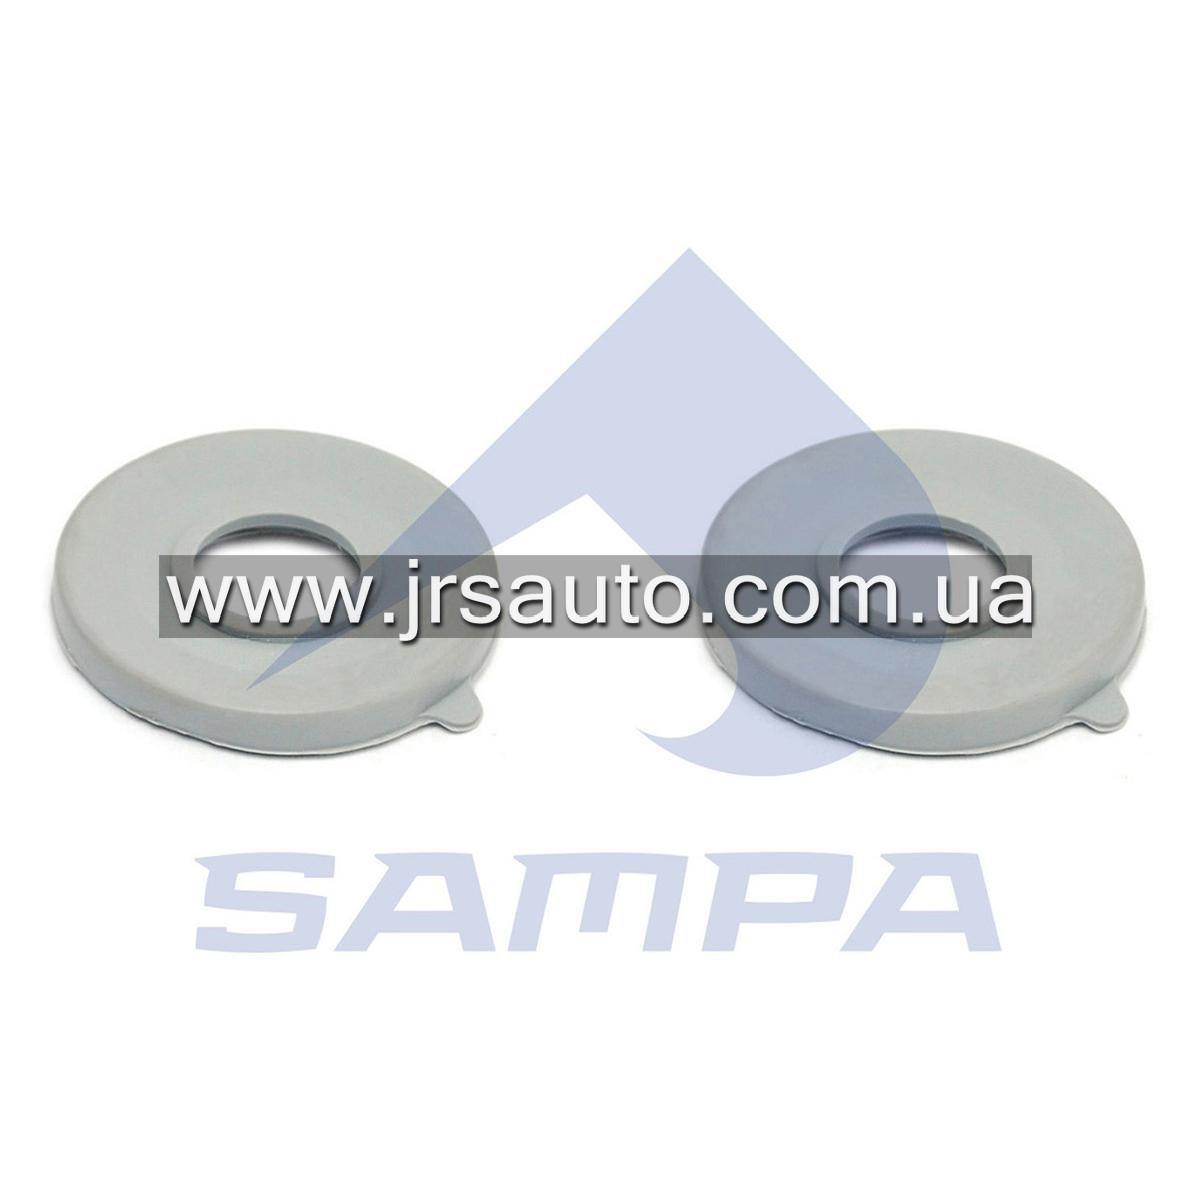 Ремкомплект суппорта MAN TGA, ROR LM/ТA/TM \MCK1139 \ 095.513